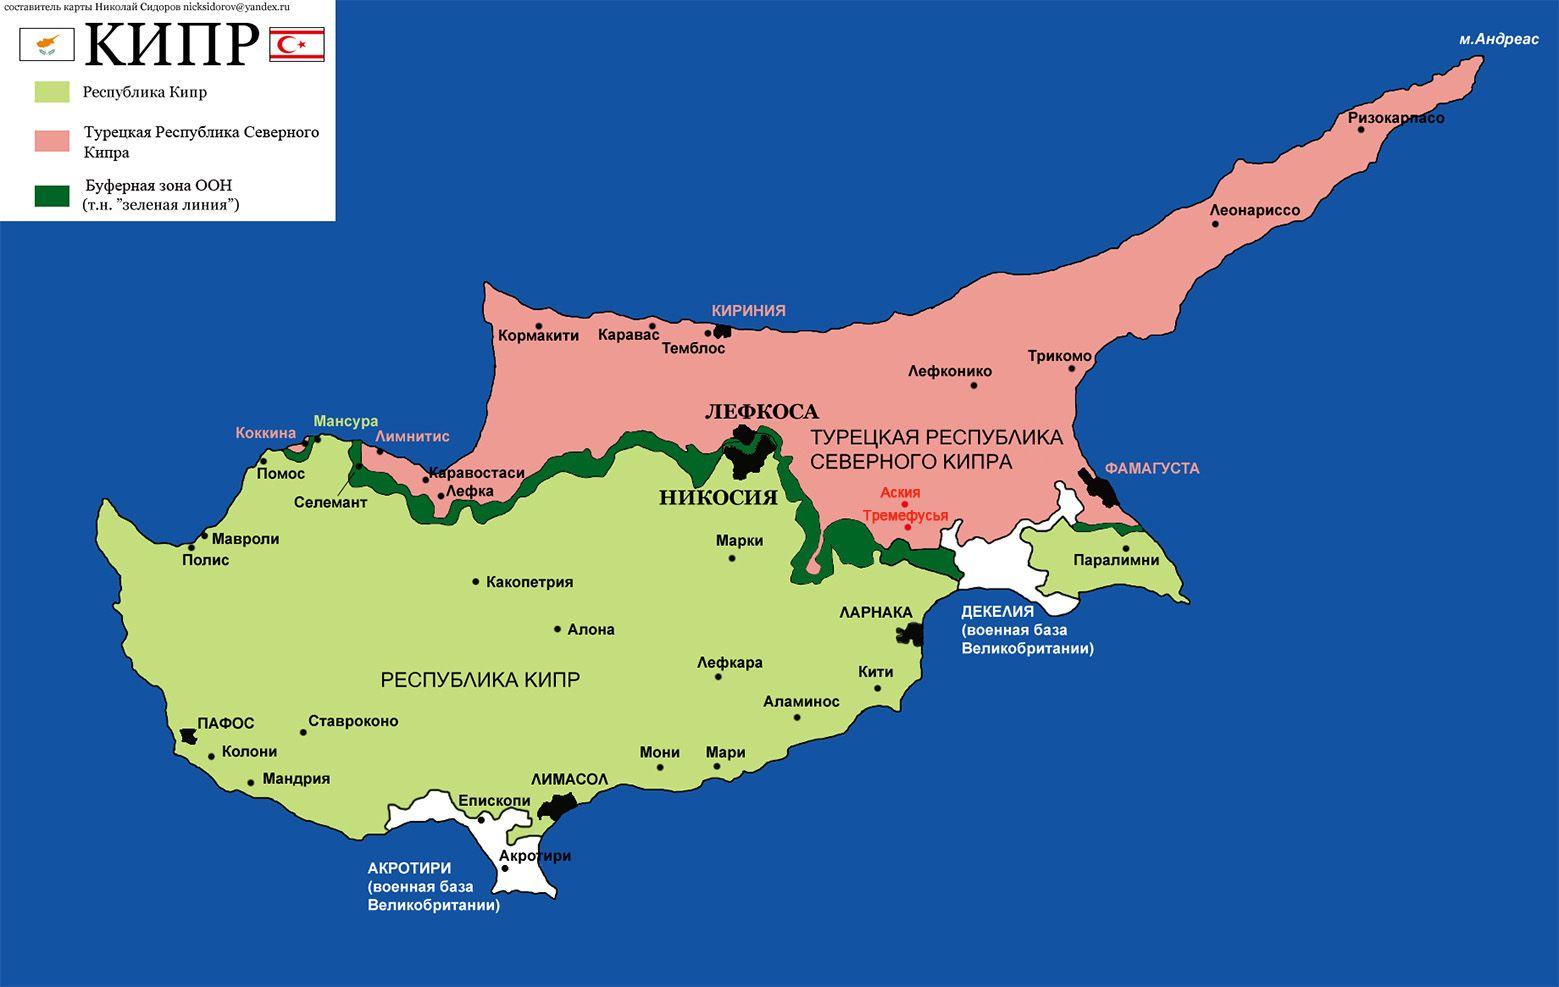 Протесты за объединение Кипра